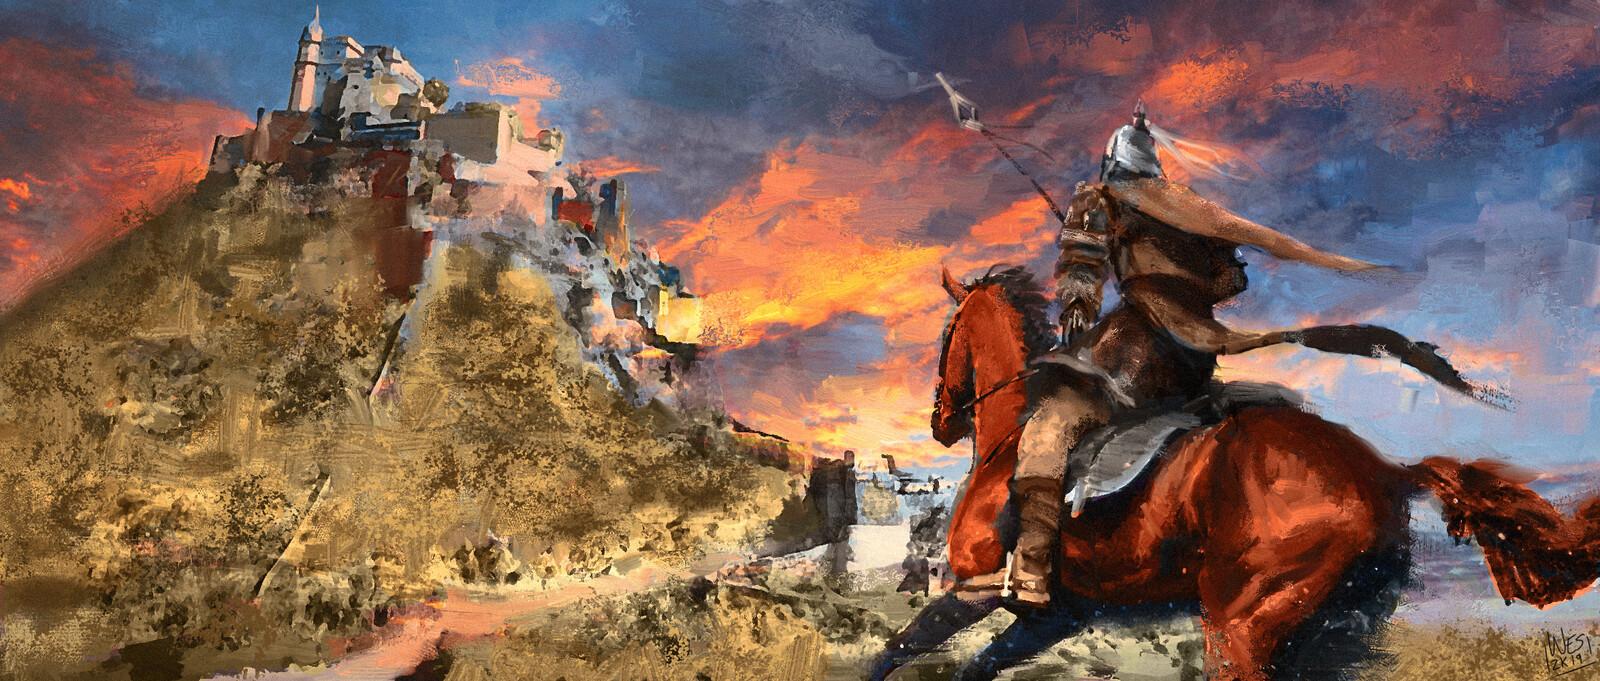 The Herald of Edoras